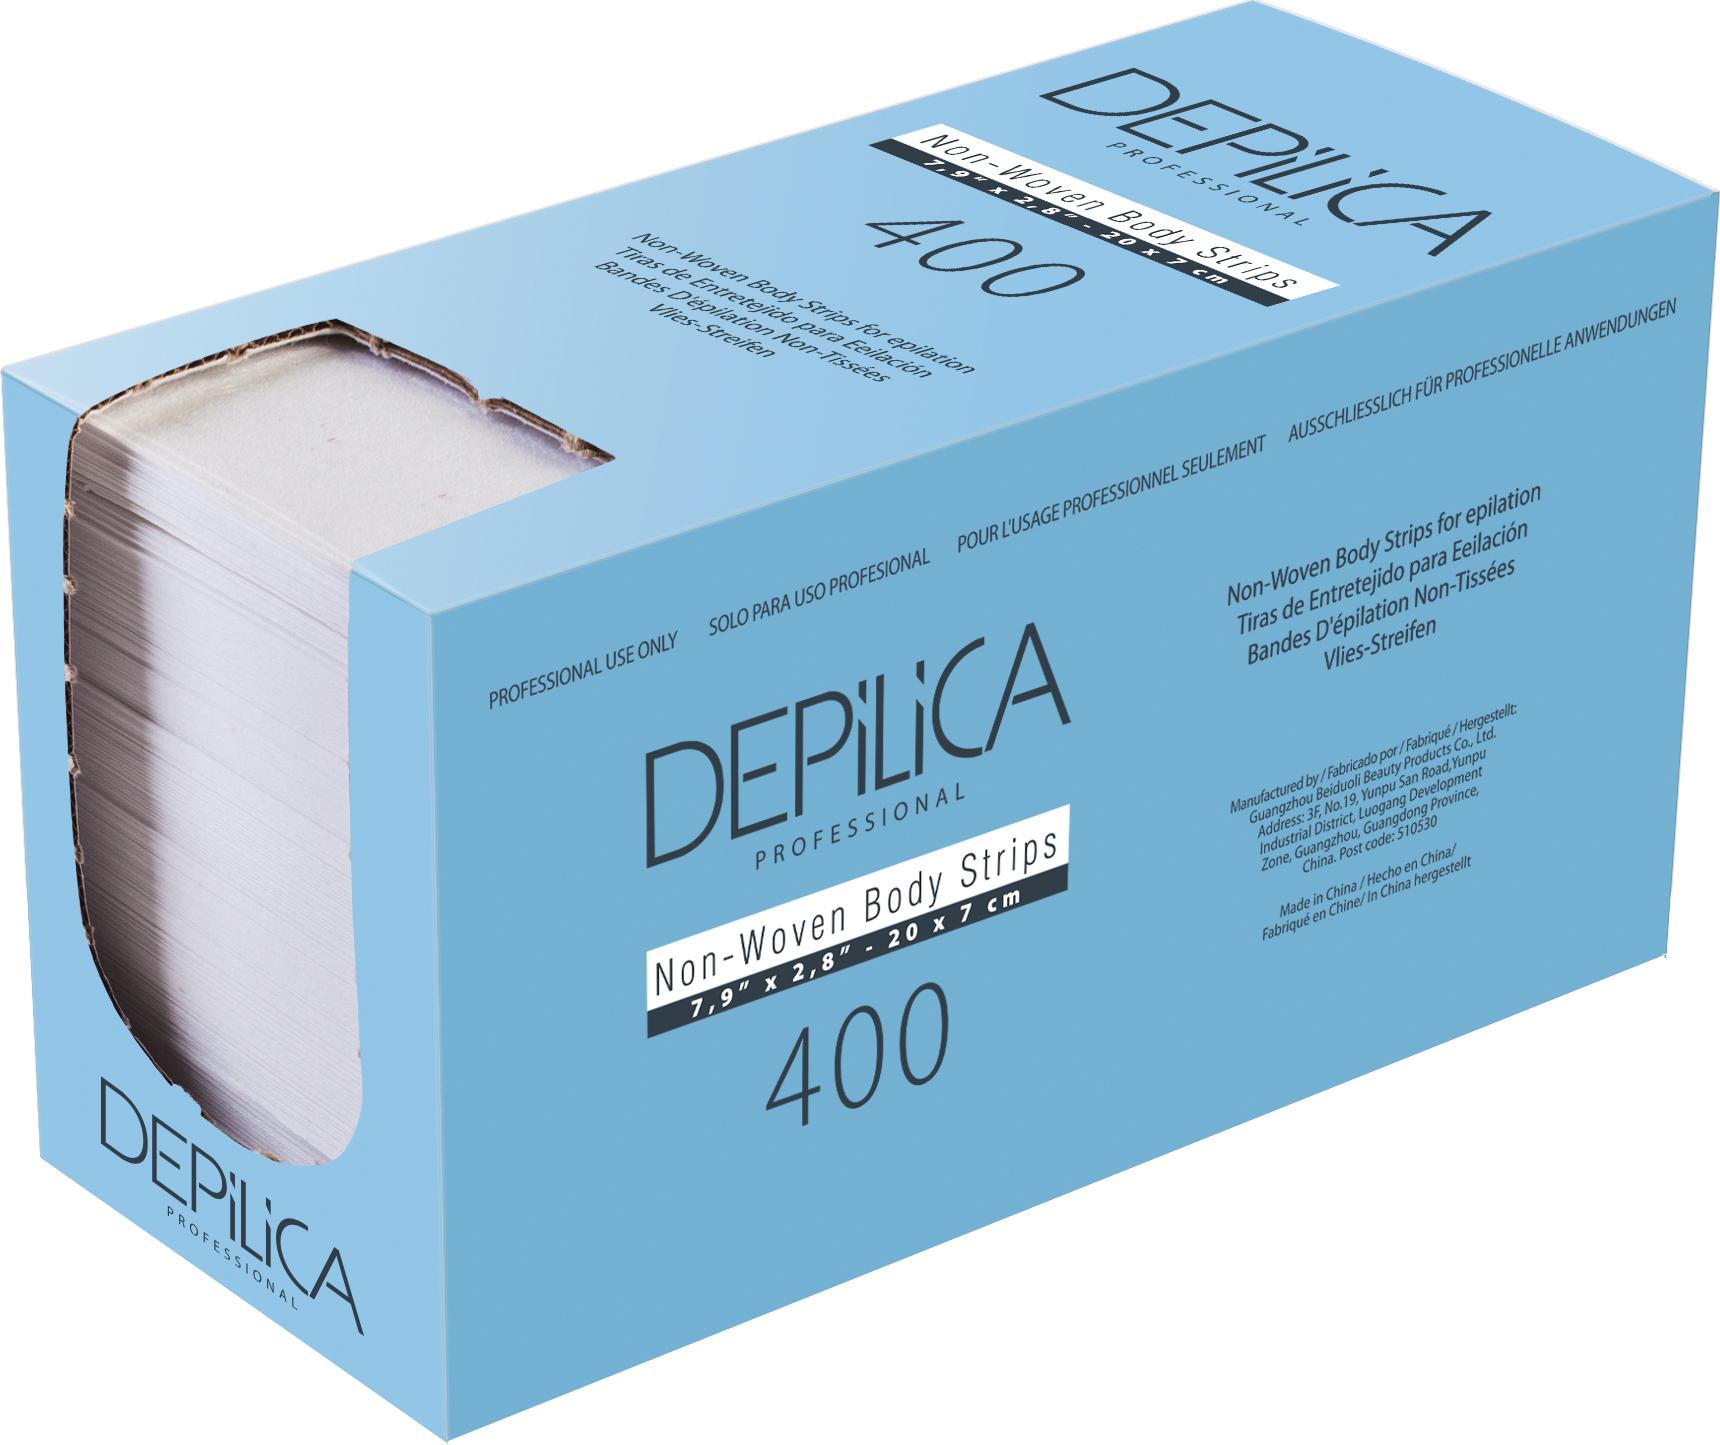 DEPILICA PROFESSIONAL Полоски нетканые для эпиляции / Non-Woven Body Strips 7*20 см 400 шт